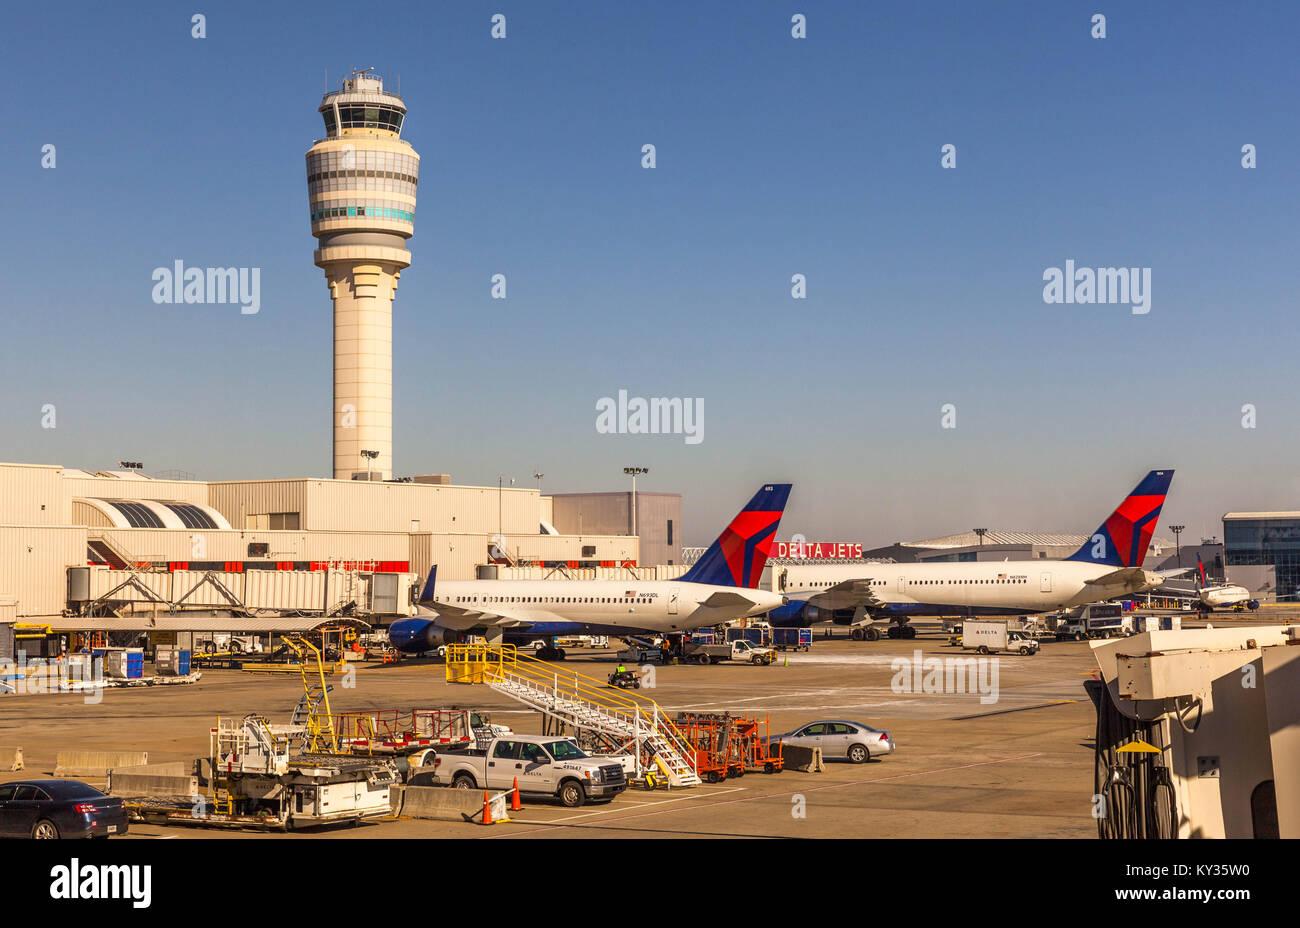 Hartsfield–Jackson Atlanta International Airport, USA. - Stock Image